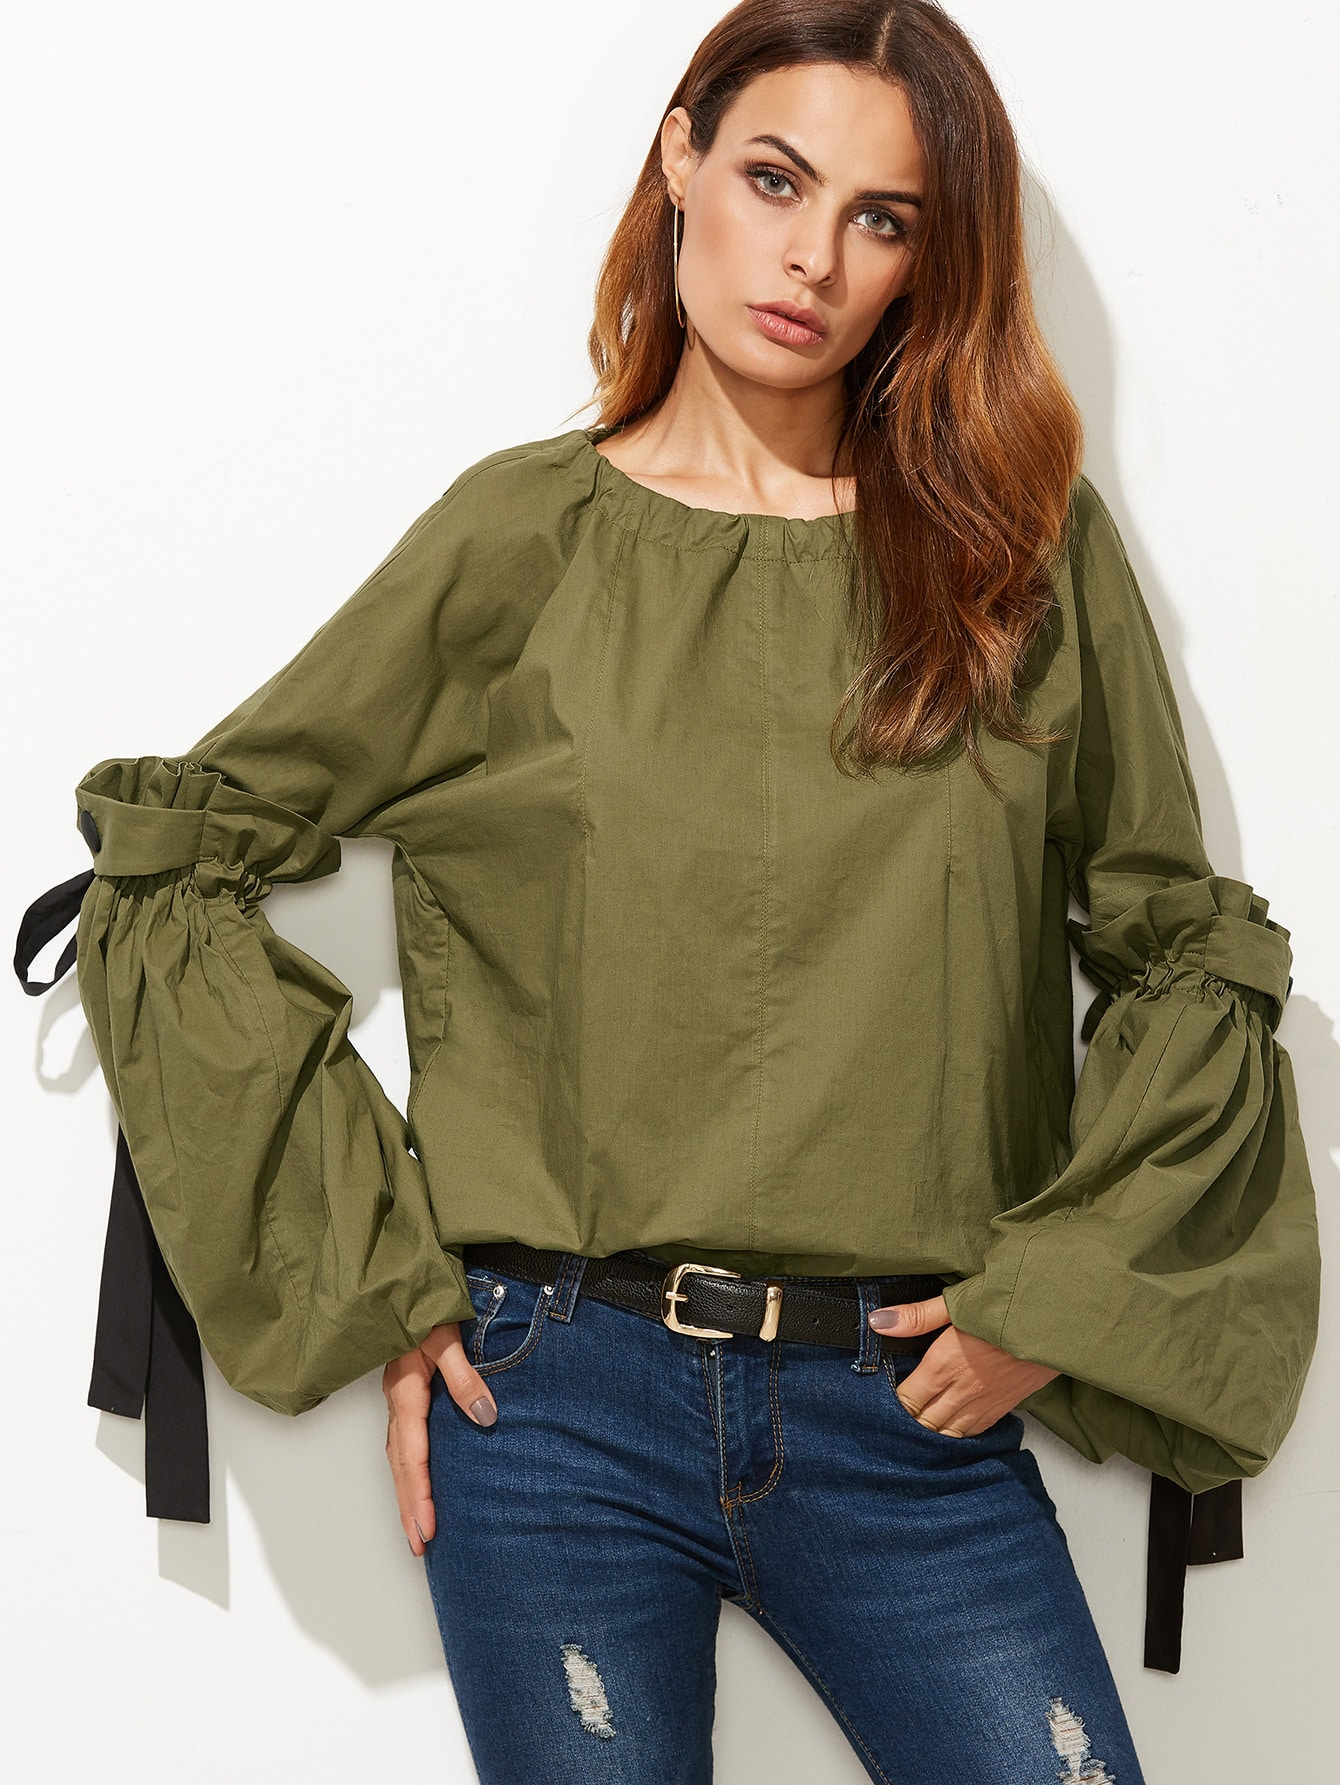 blouse161031702_2